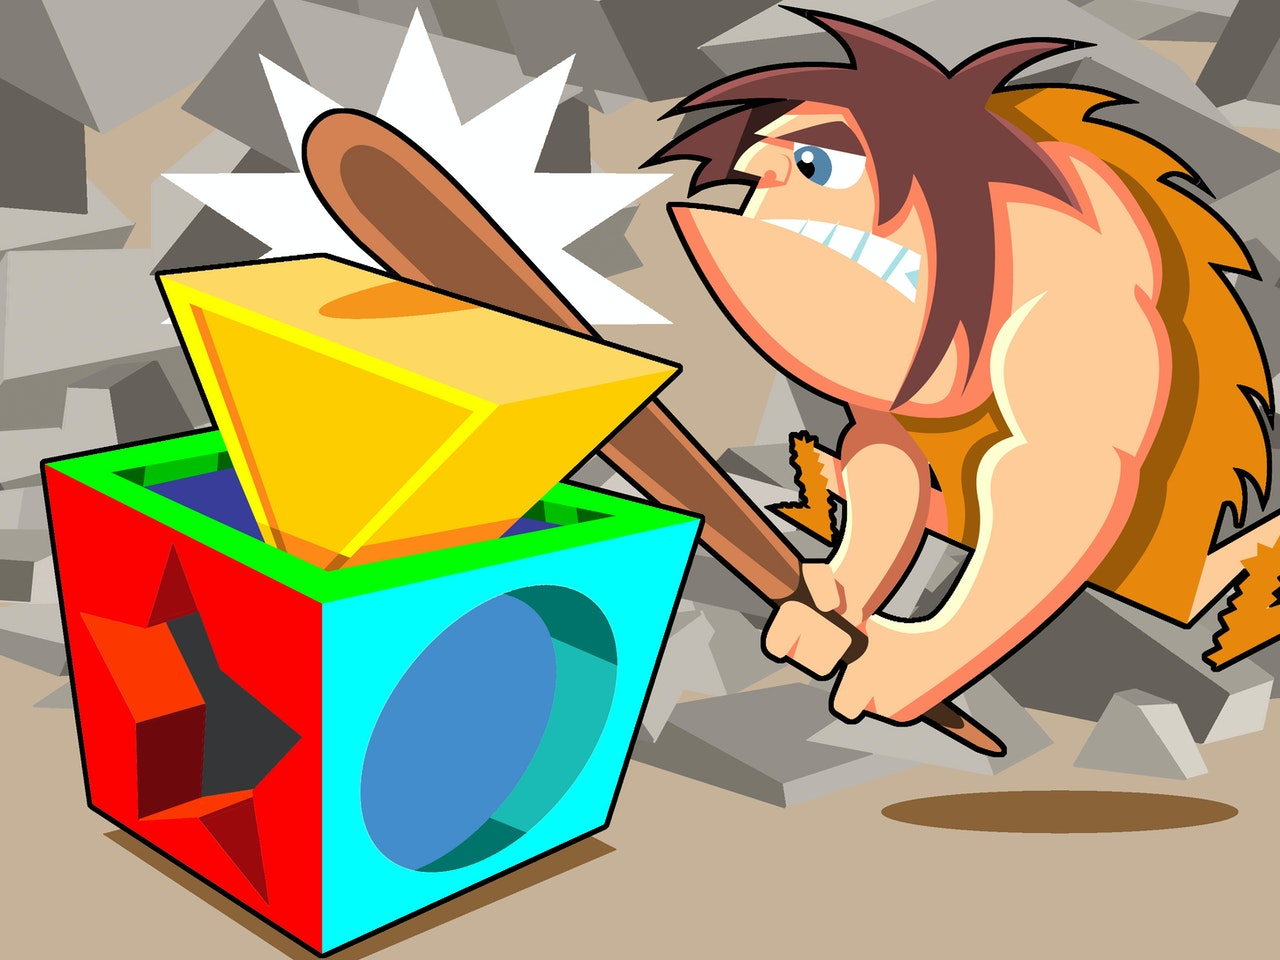 funny happy comical colourful graphic  caveman club childrens block toy prehistoric dinosaur flintstones